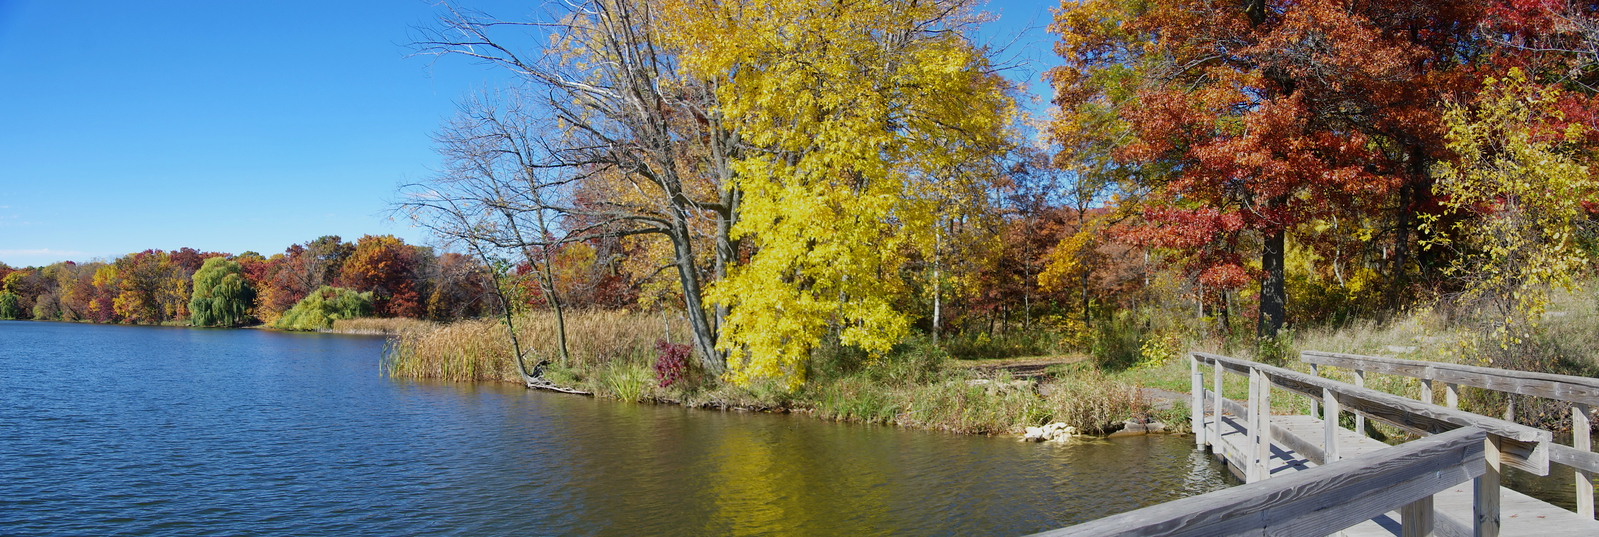 Joy Park - Maplewood